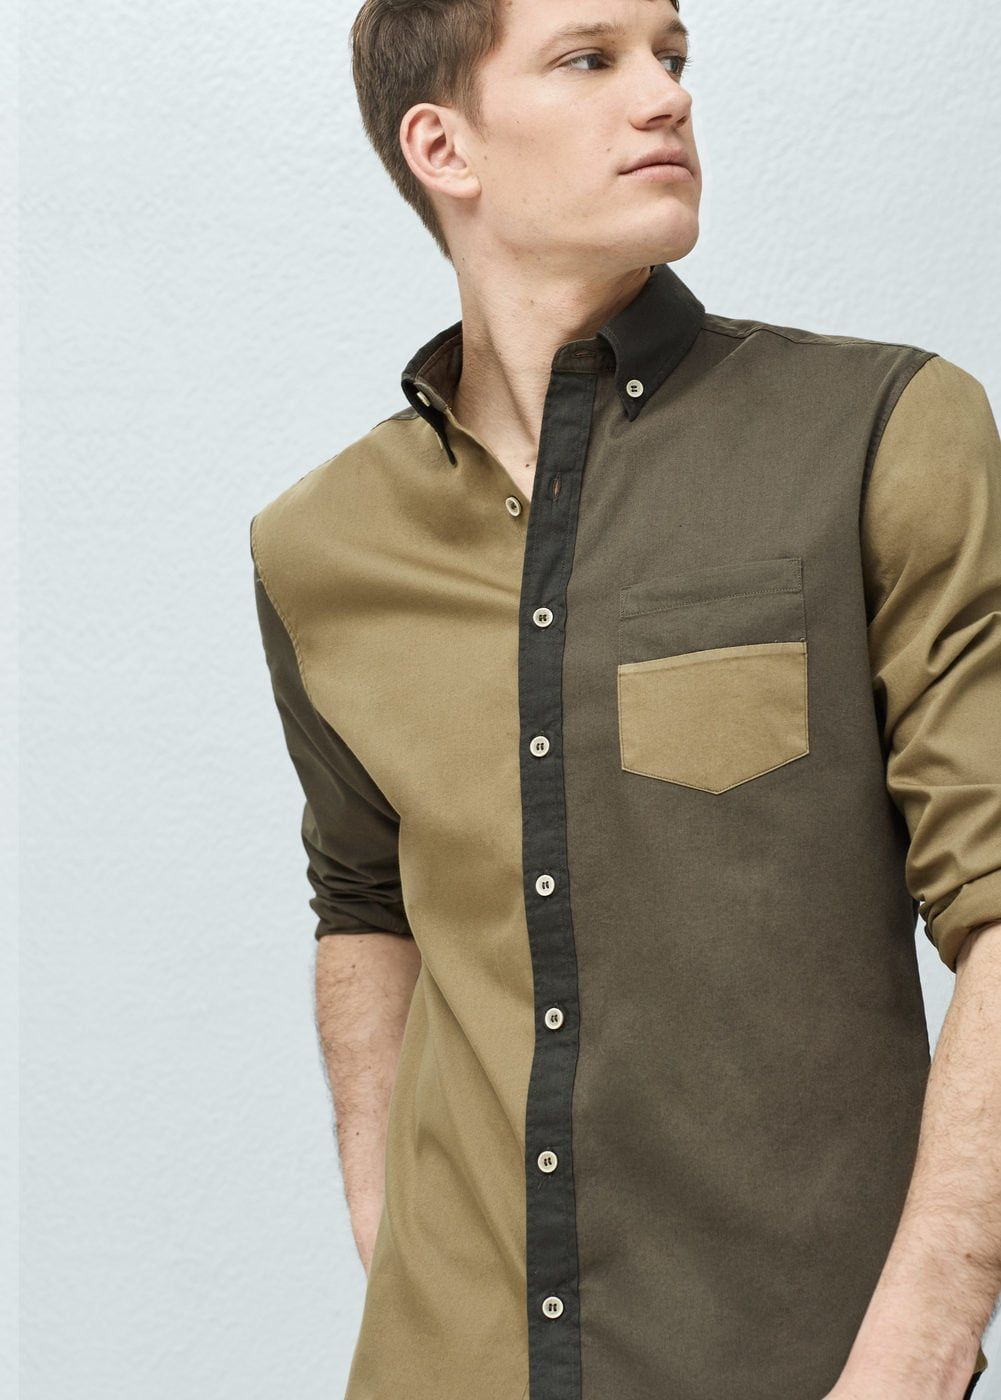 Slim Fit Color Block Shirt Man In 2019 Nafees Pinterest